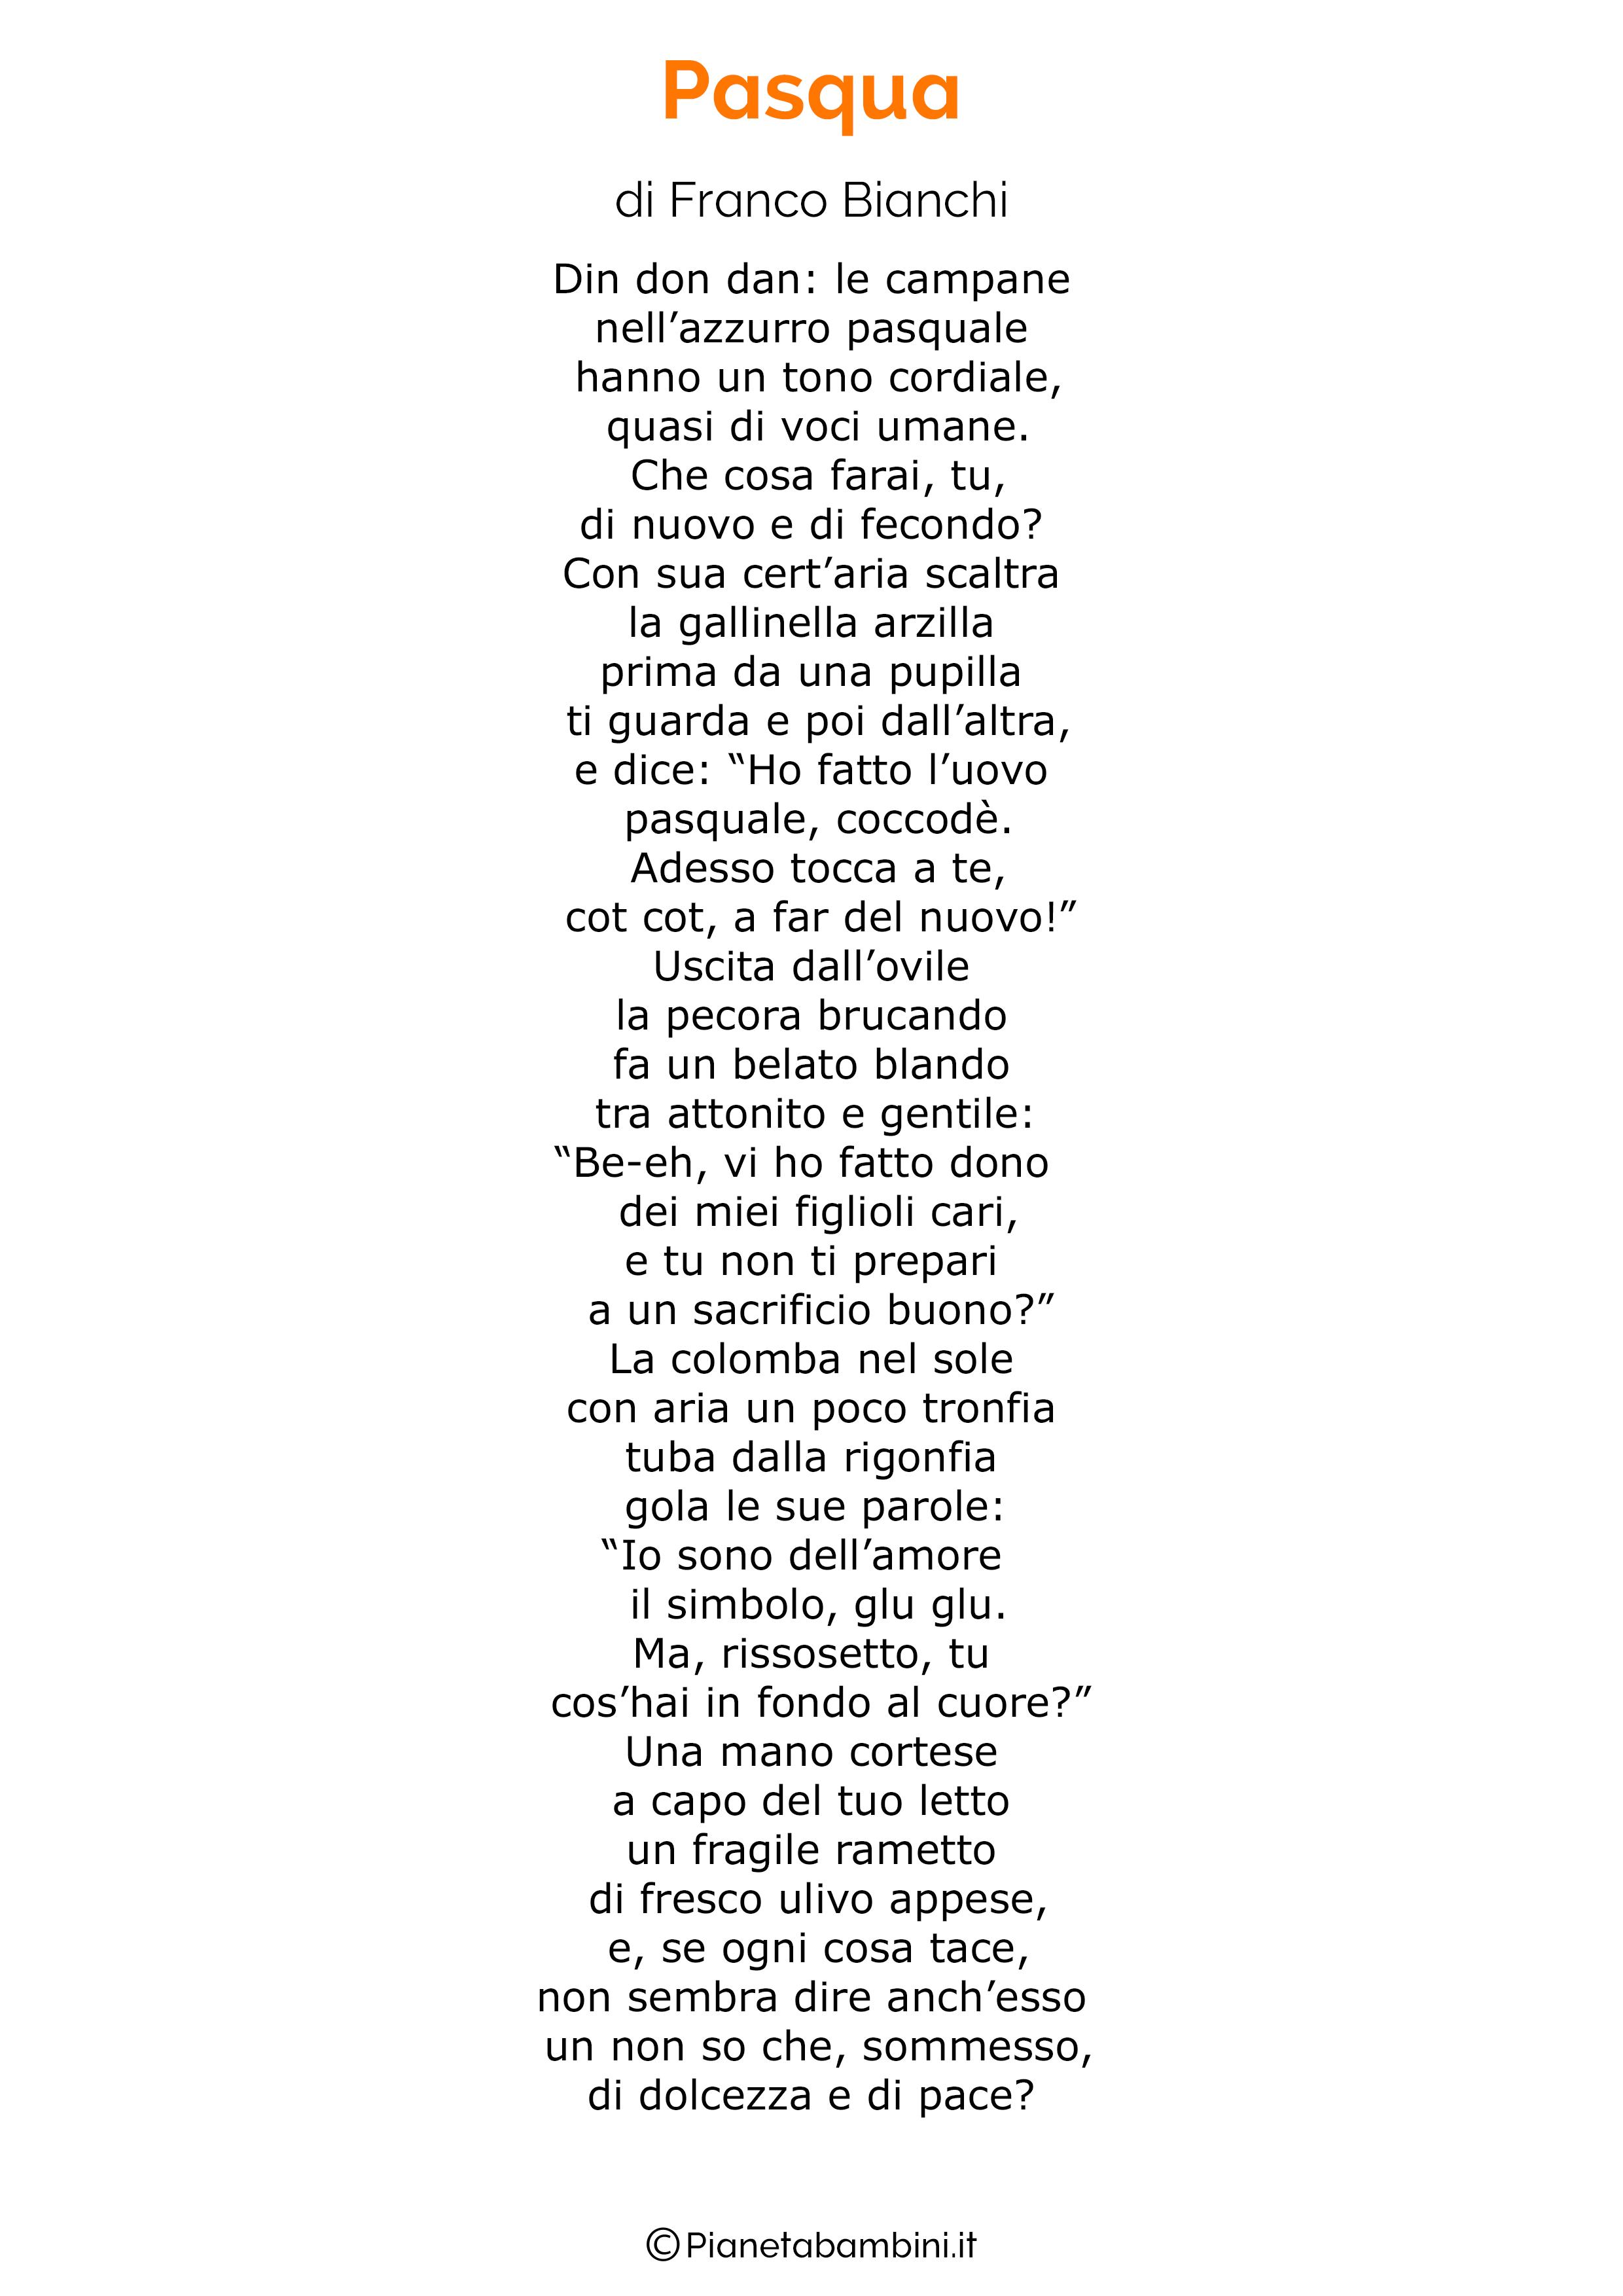 Poesia di Pasqua 29